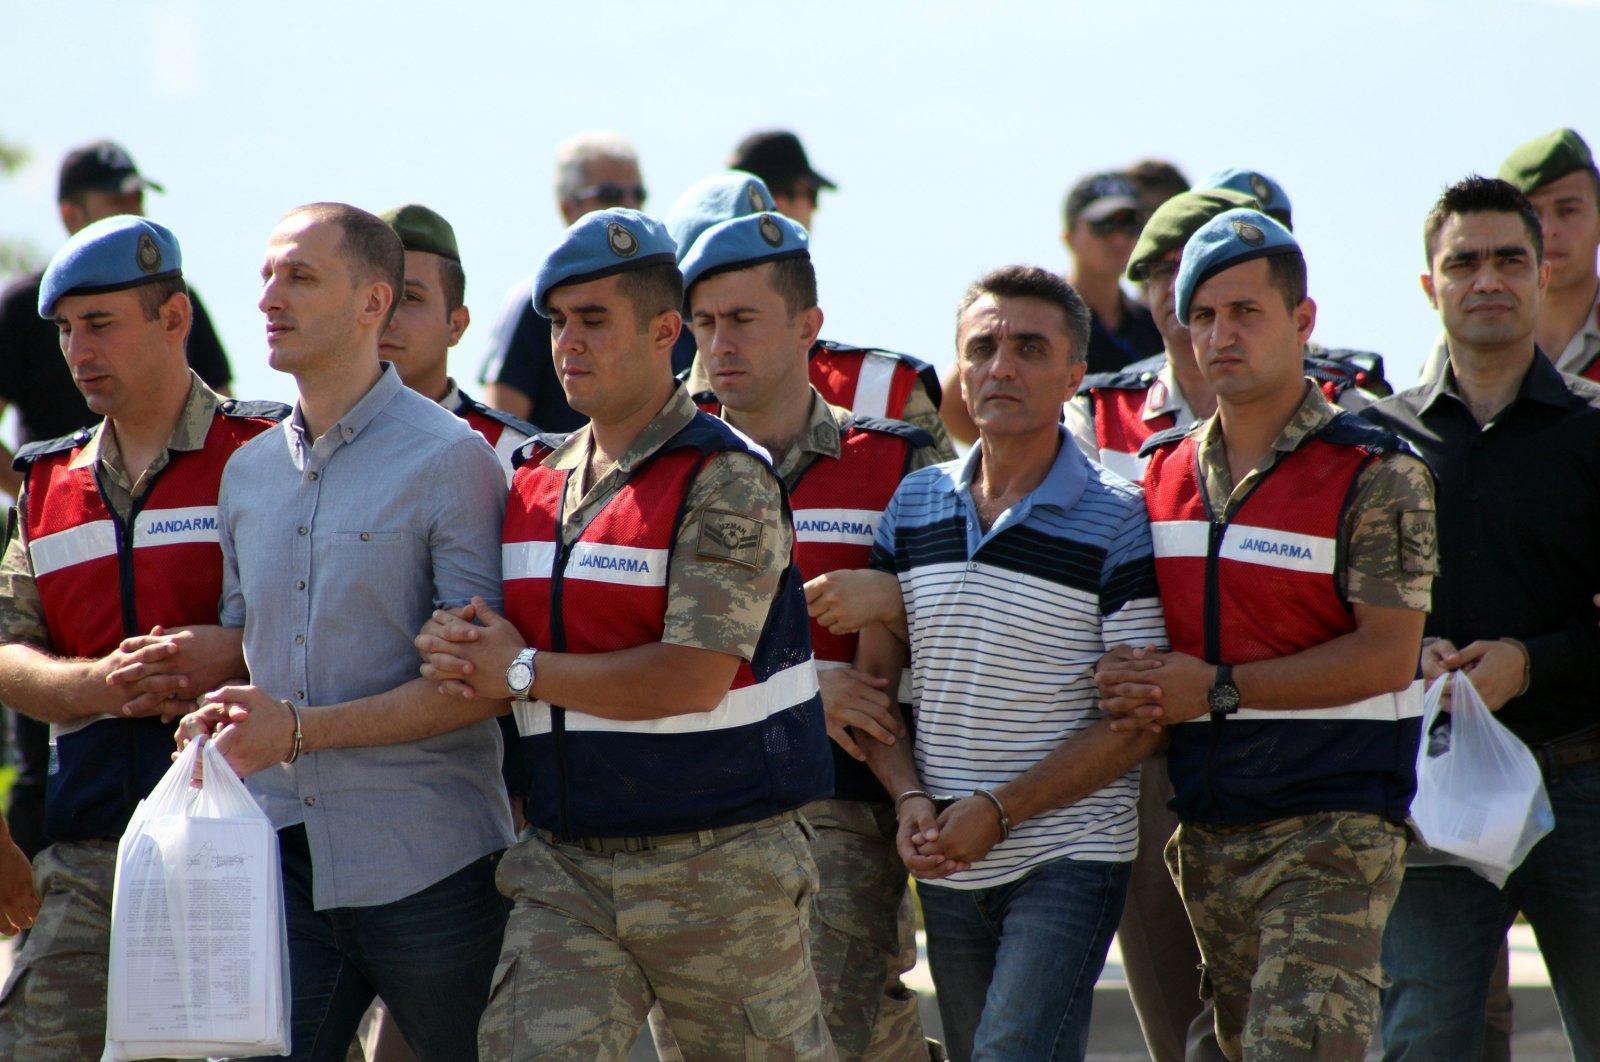 Gendarmerie officers escort defendants in the case to the courthouse, in Muğla, southwestern Turkey, July 21, 2017. (İHA PHOTO)